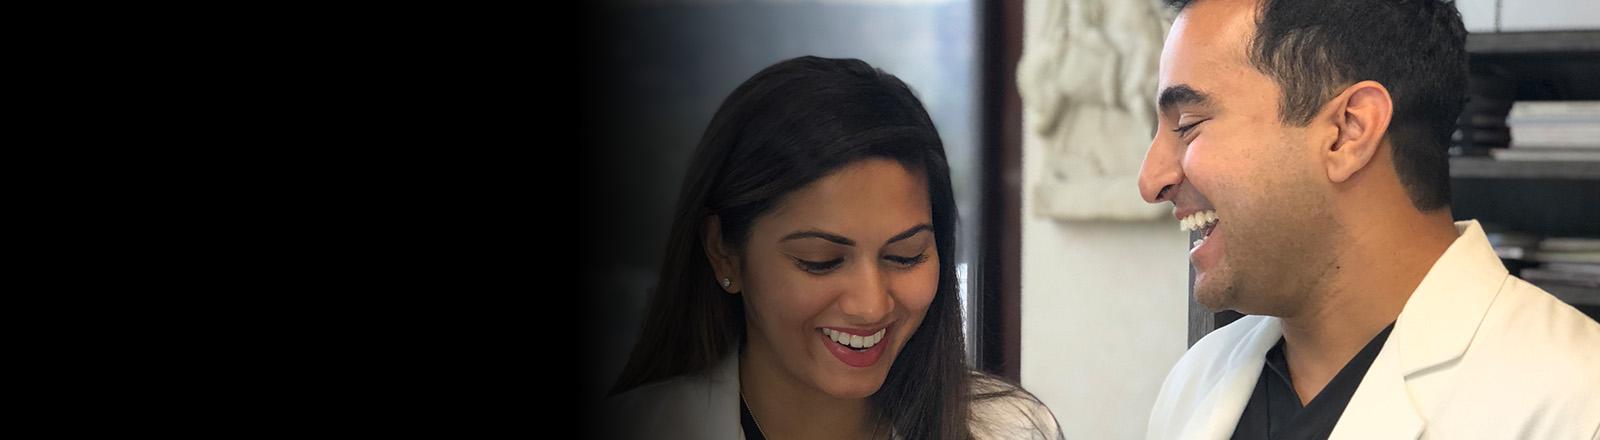 Dr. Puja Roy and Dr Deepak Dugar smiling